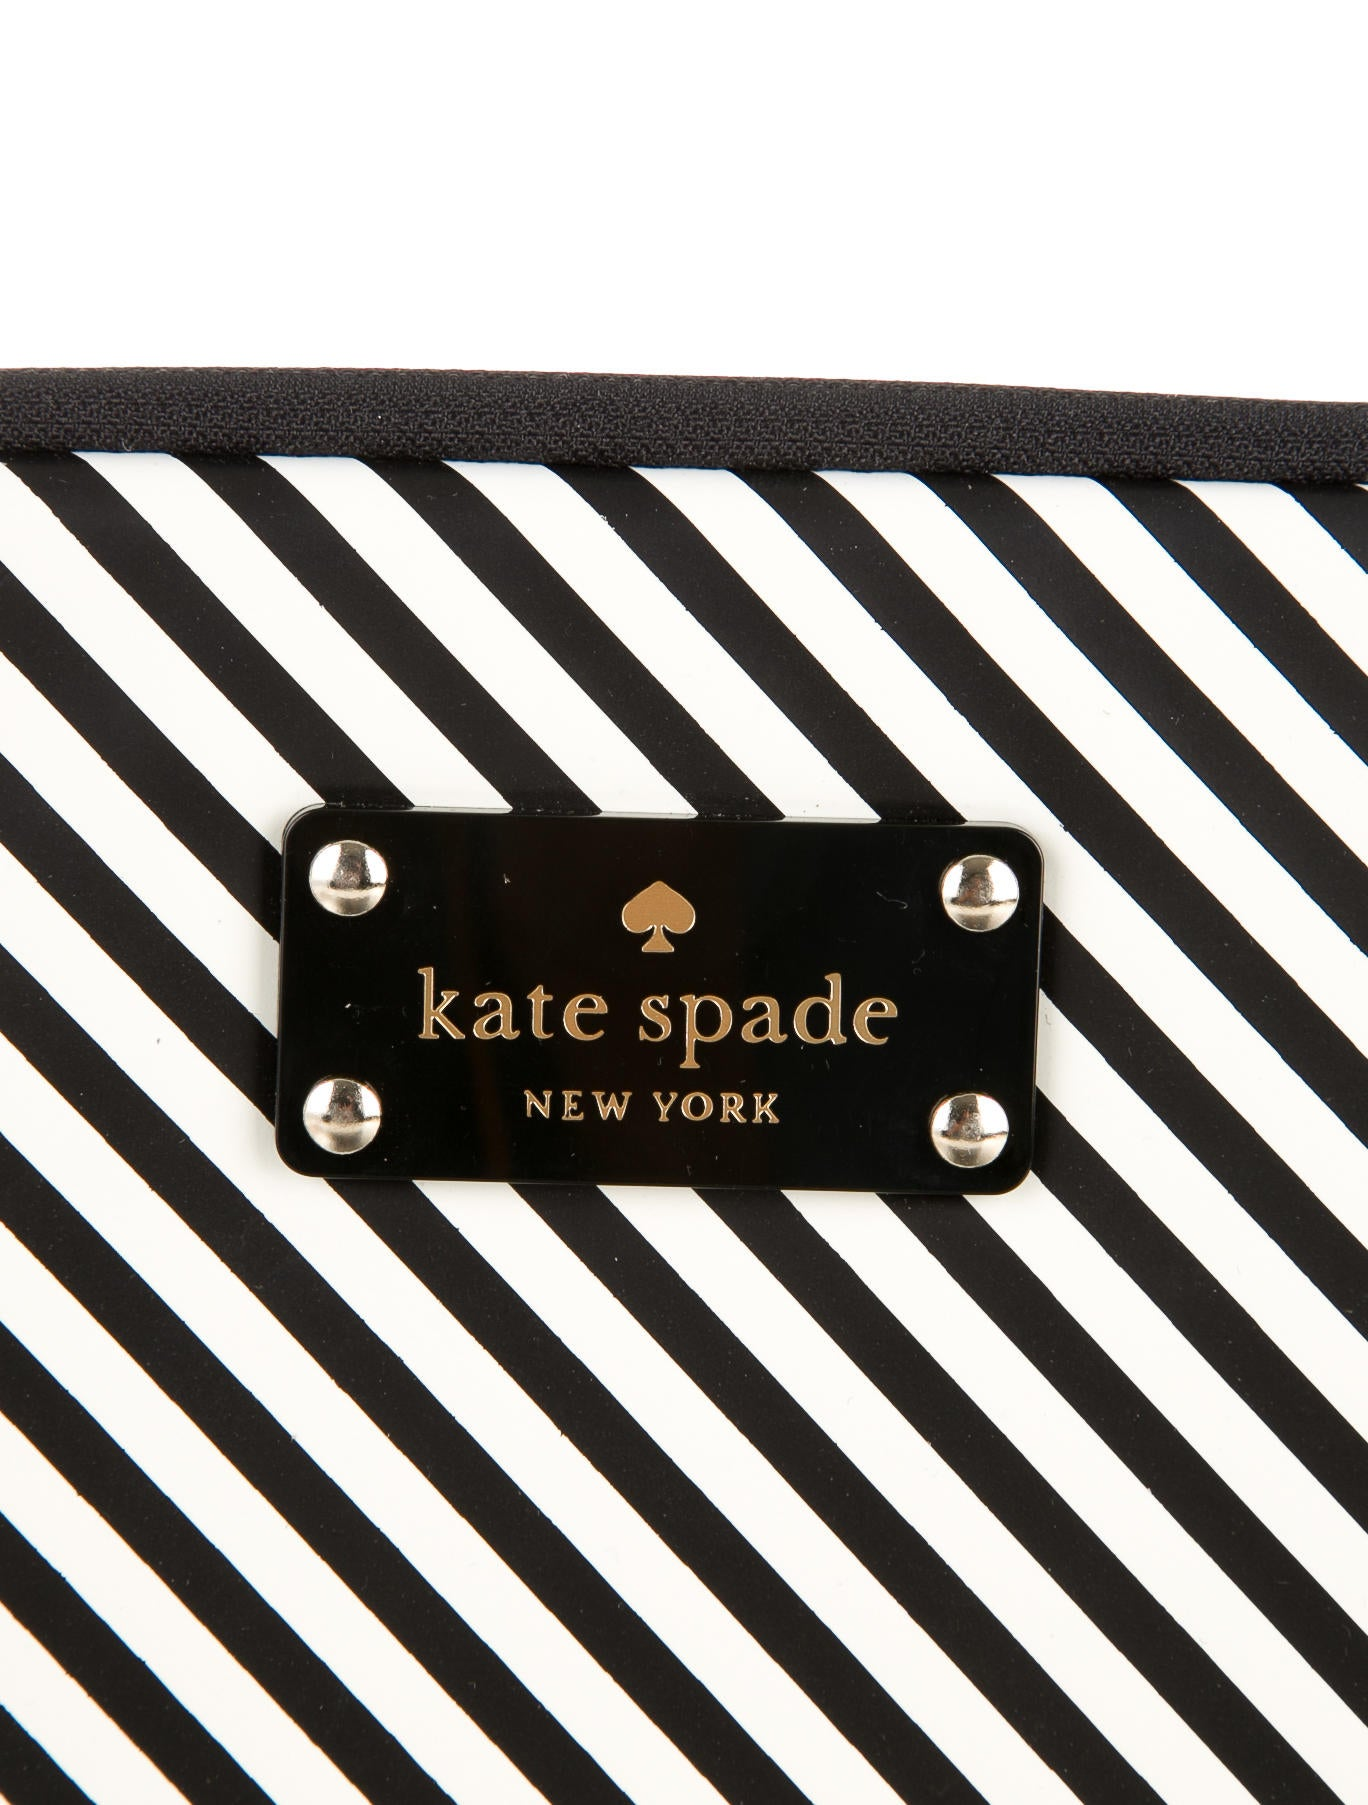 kate spade new york ipad case accessories wka29721 the realreal. Black Bedroom Furniture Sets. Home Design Ideas